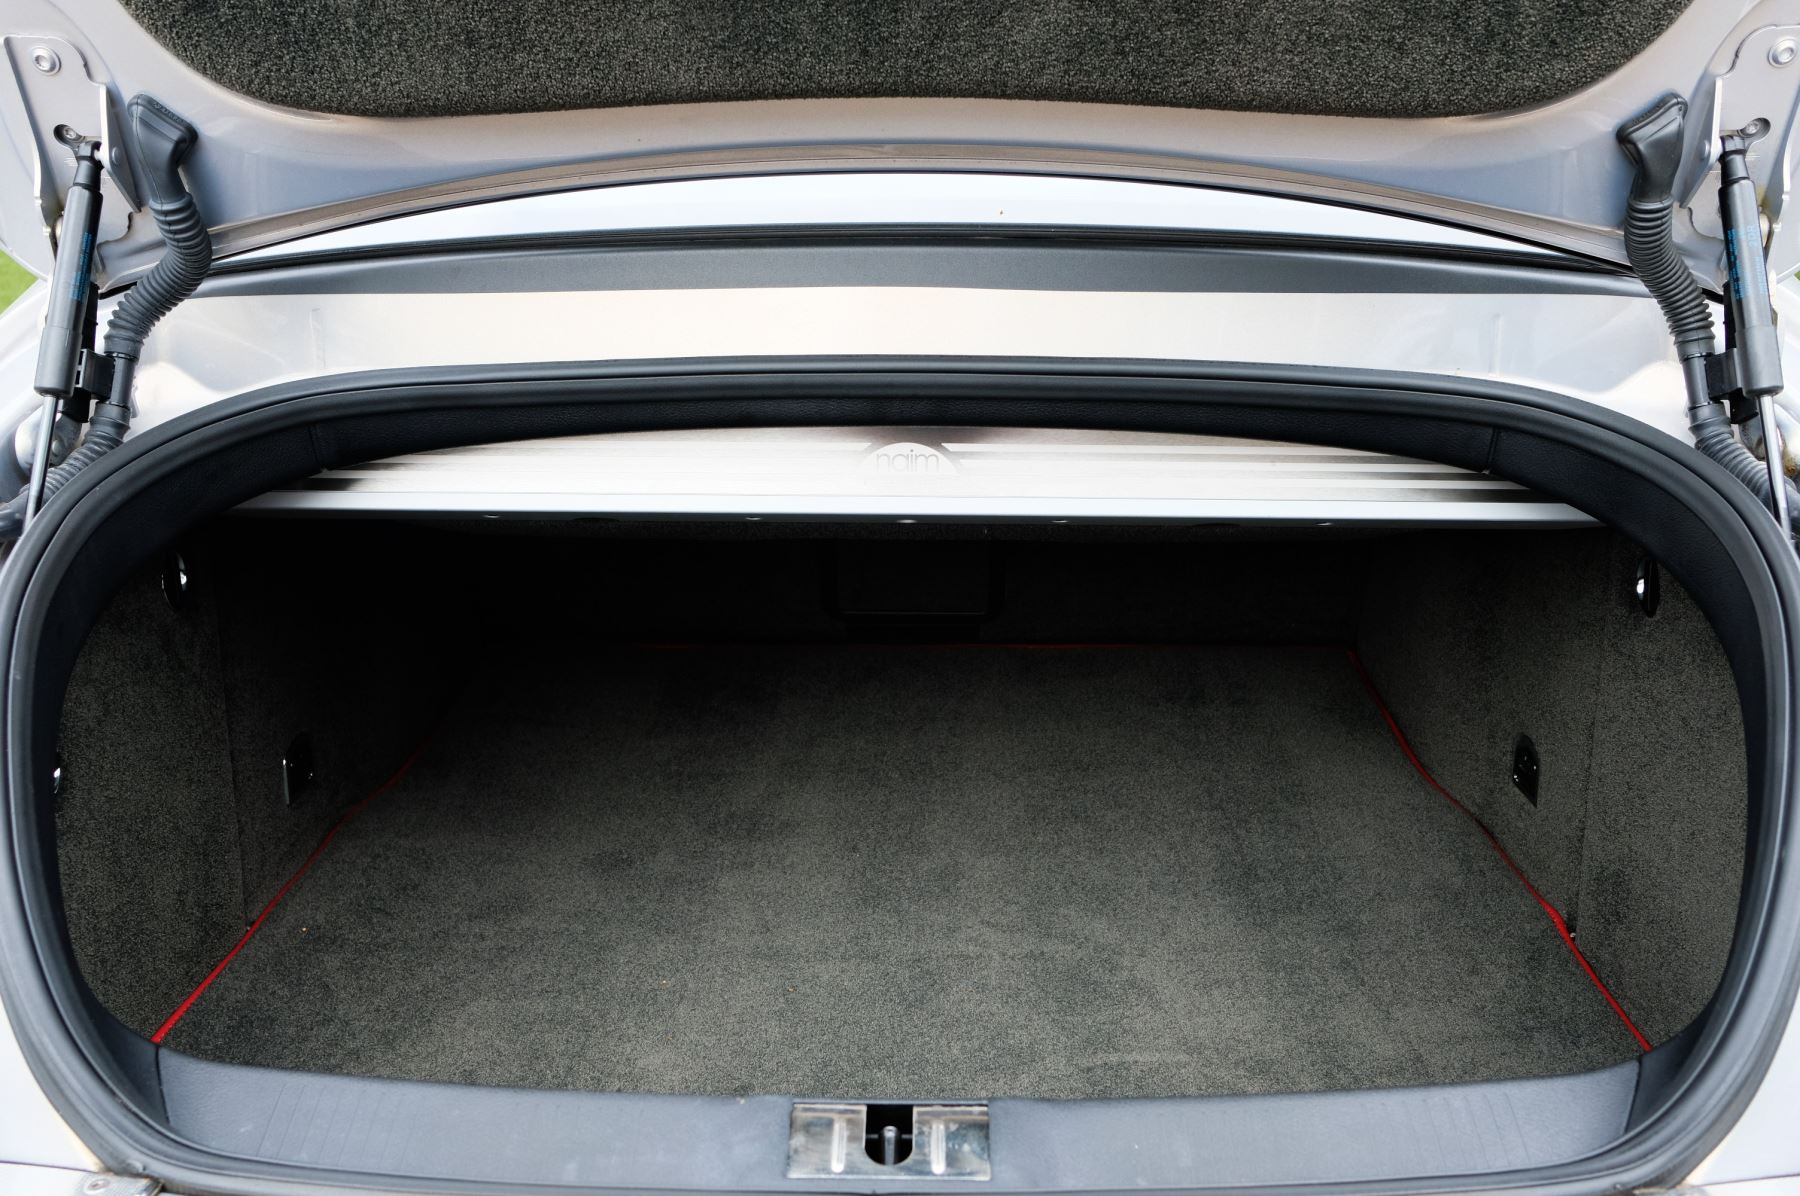 Bentley Continental GT 6.0 W12 [635] Speed - Premier Specification - Carbon Fibre Fascia Panels image 11